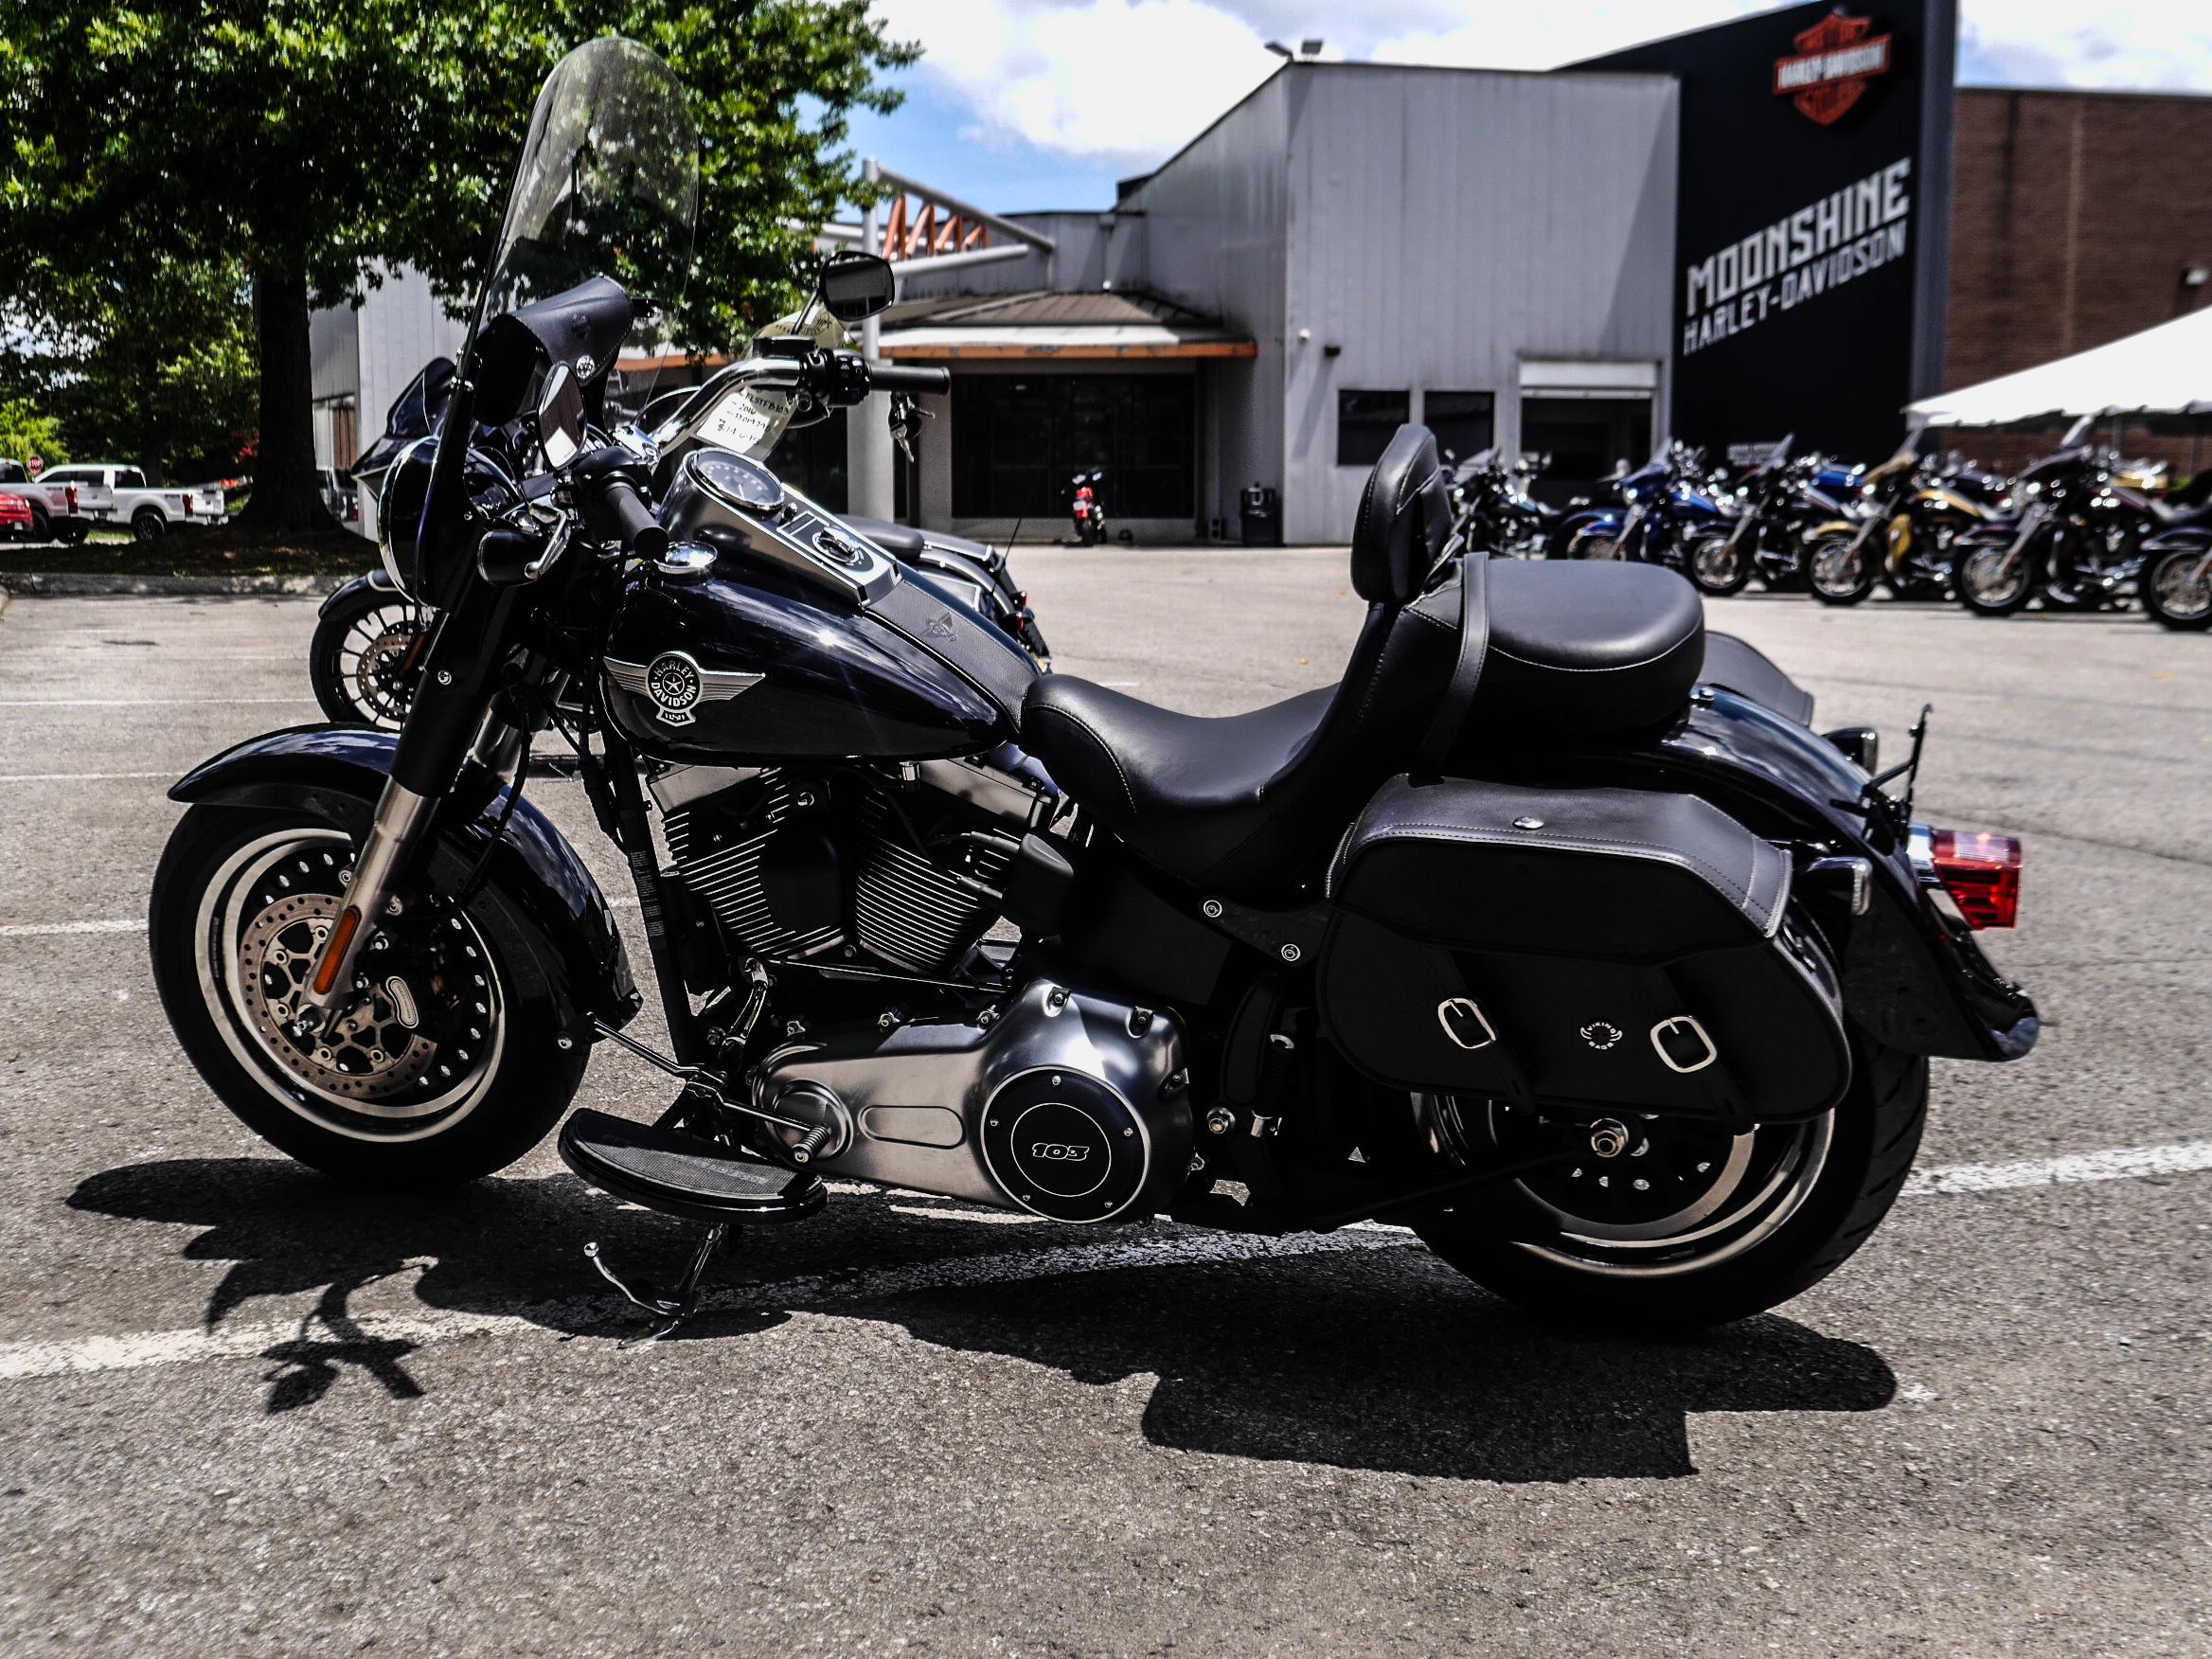 Pre-Owned 2016 Harley-Davidson Fat Boy Lo